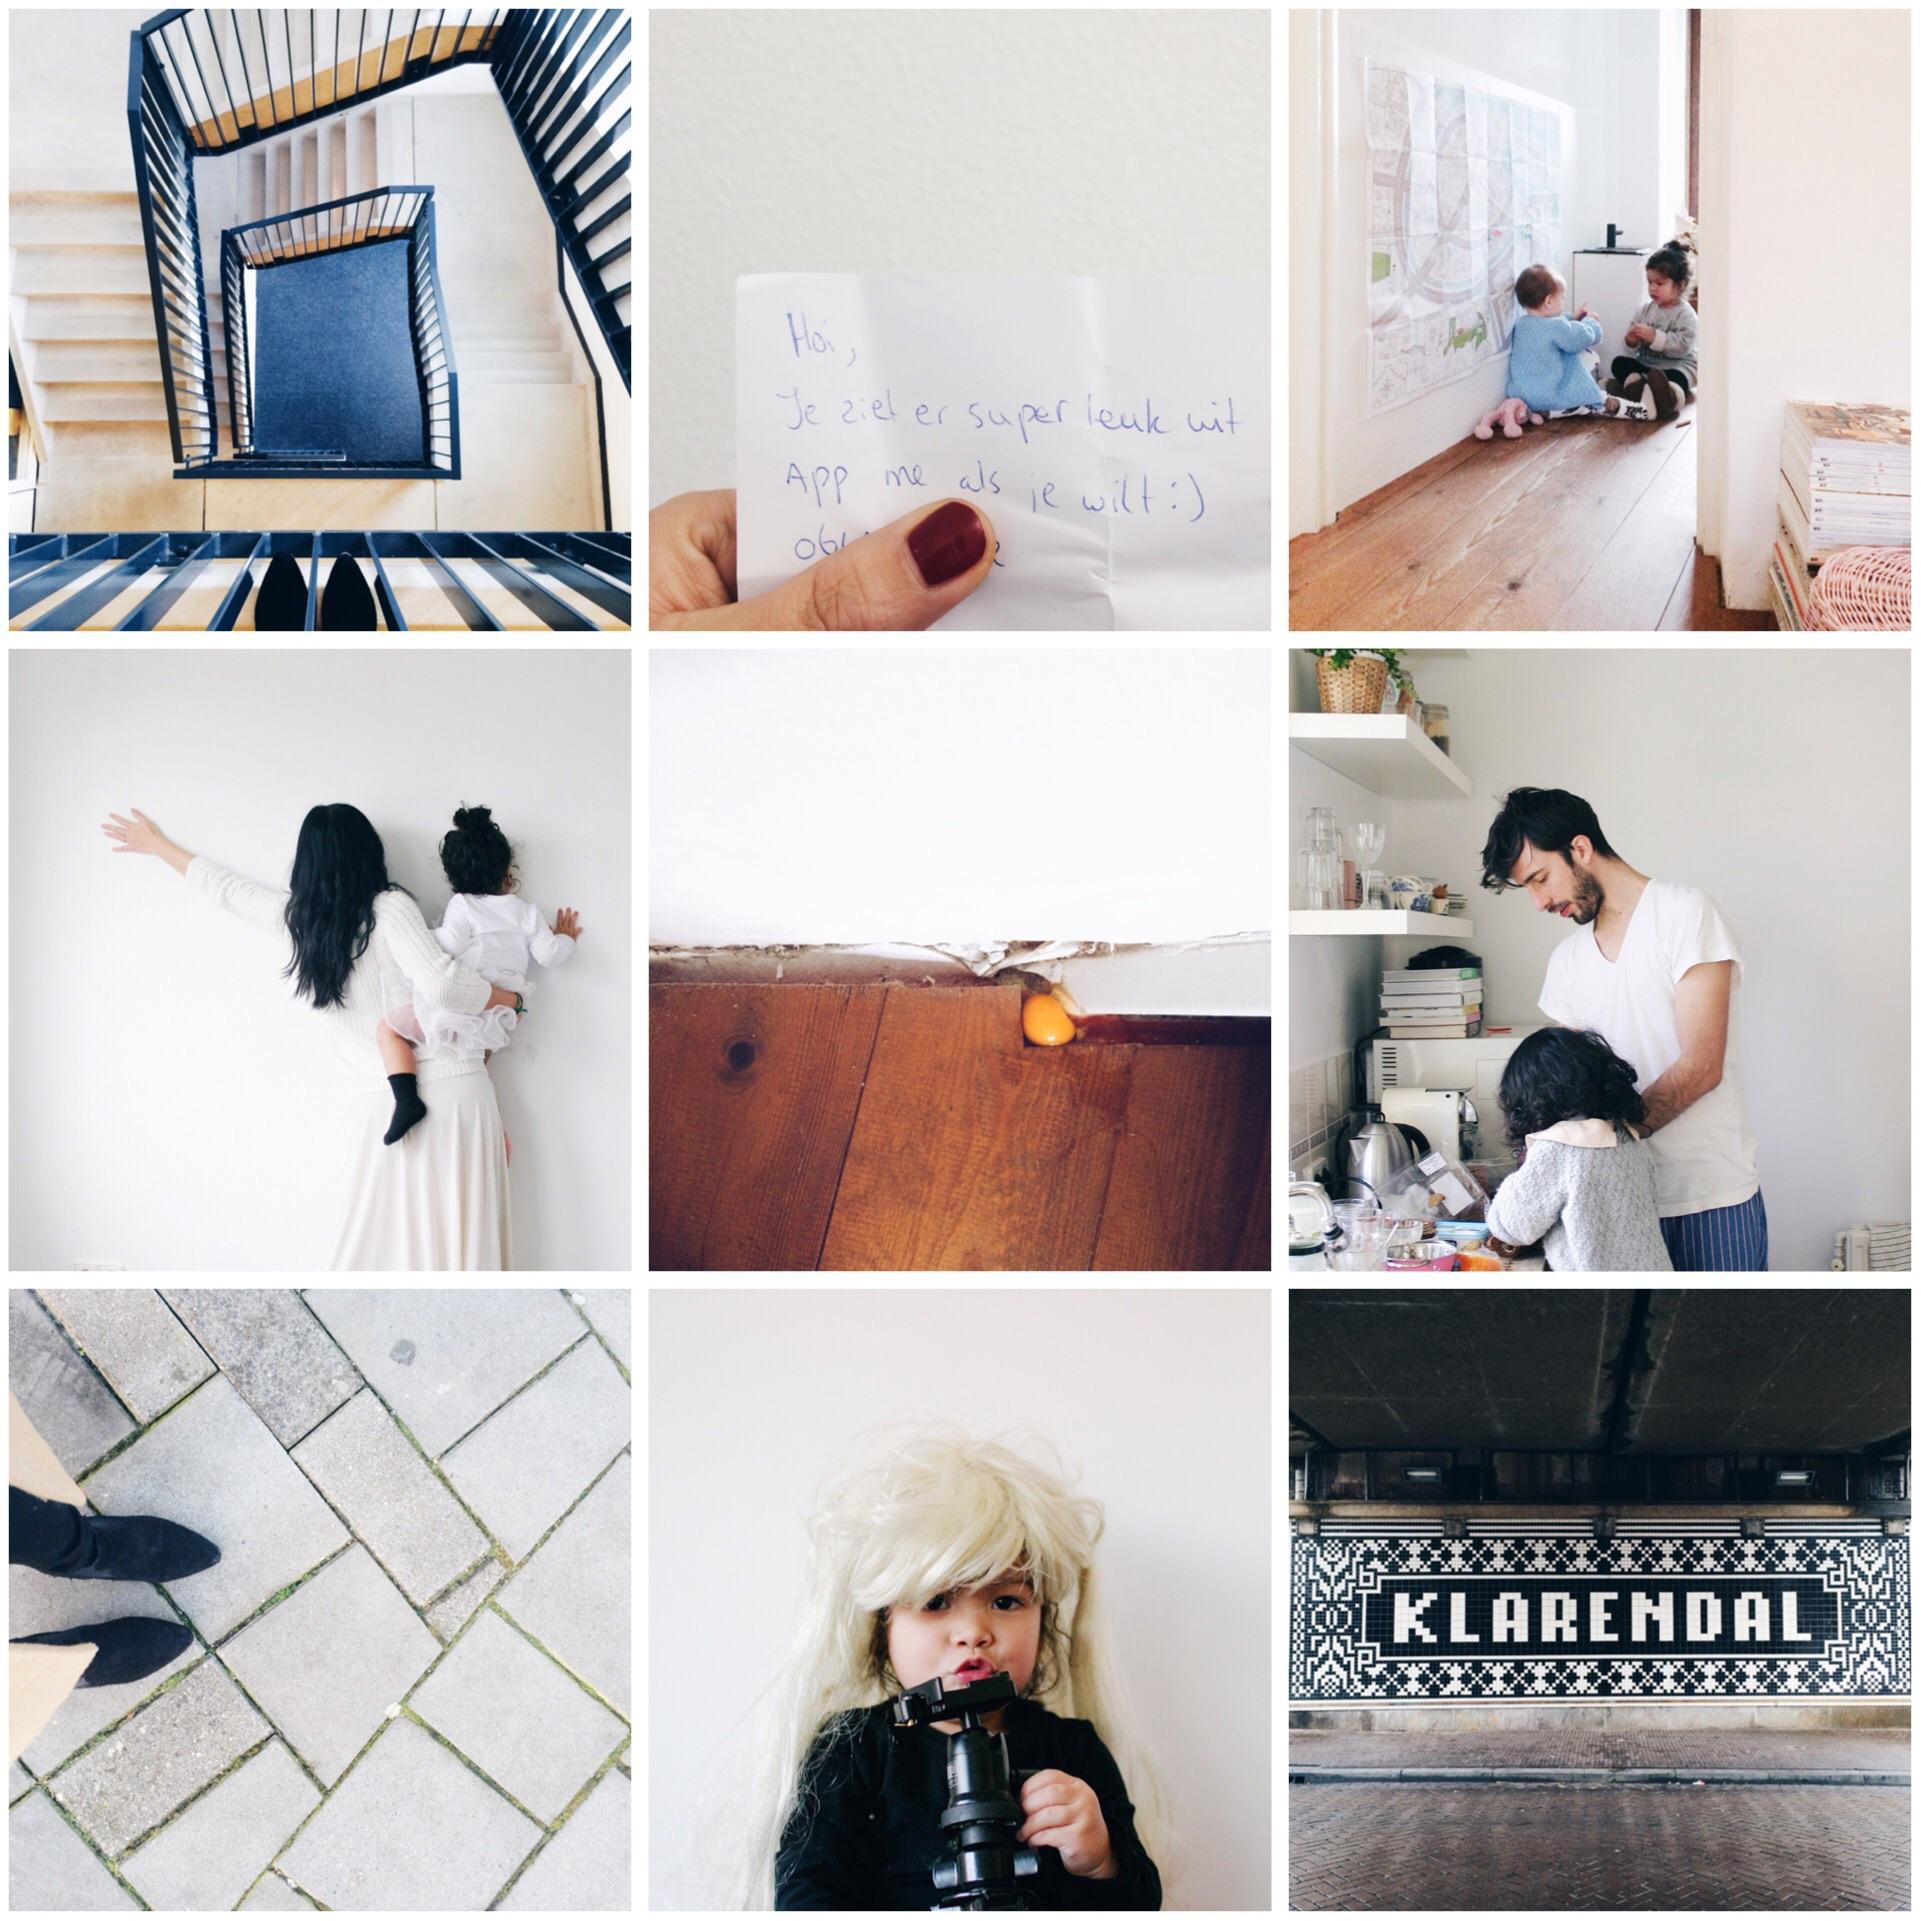 february on instagram @viebonacci